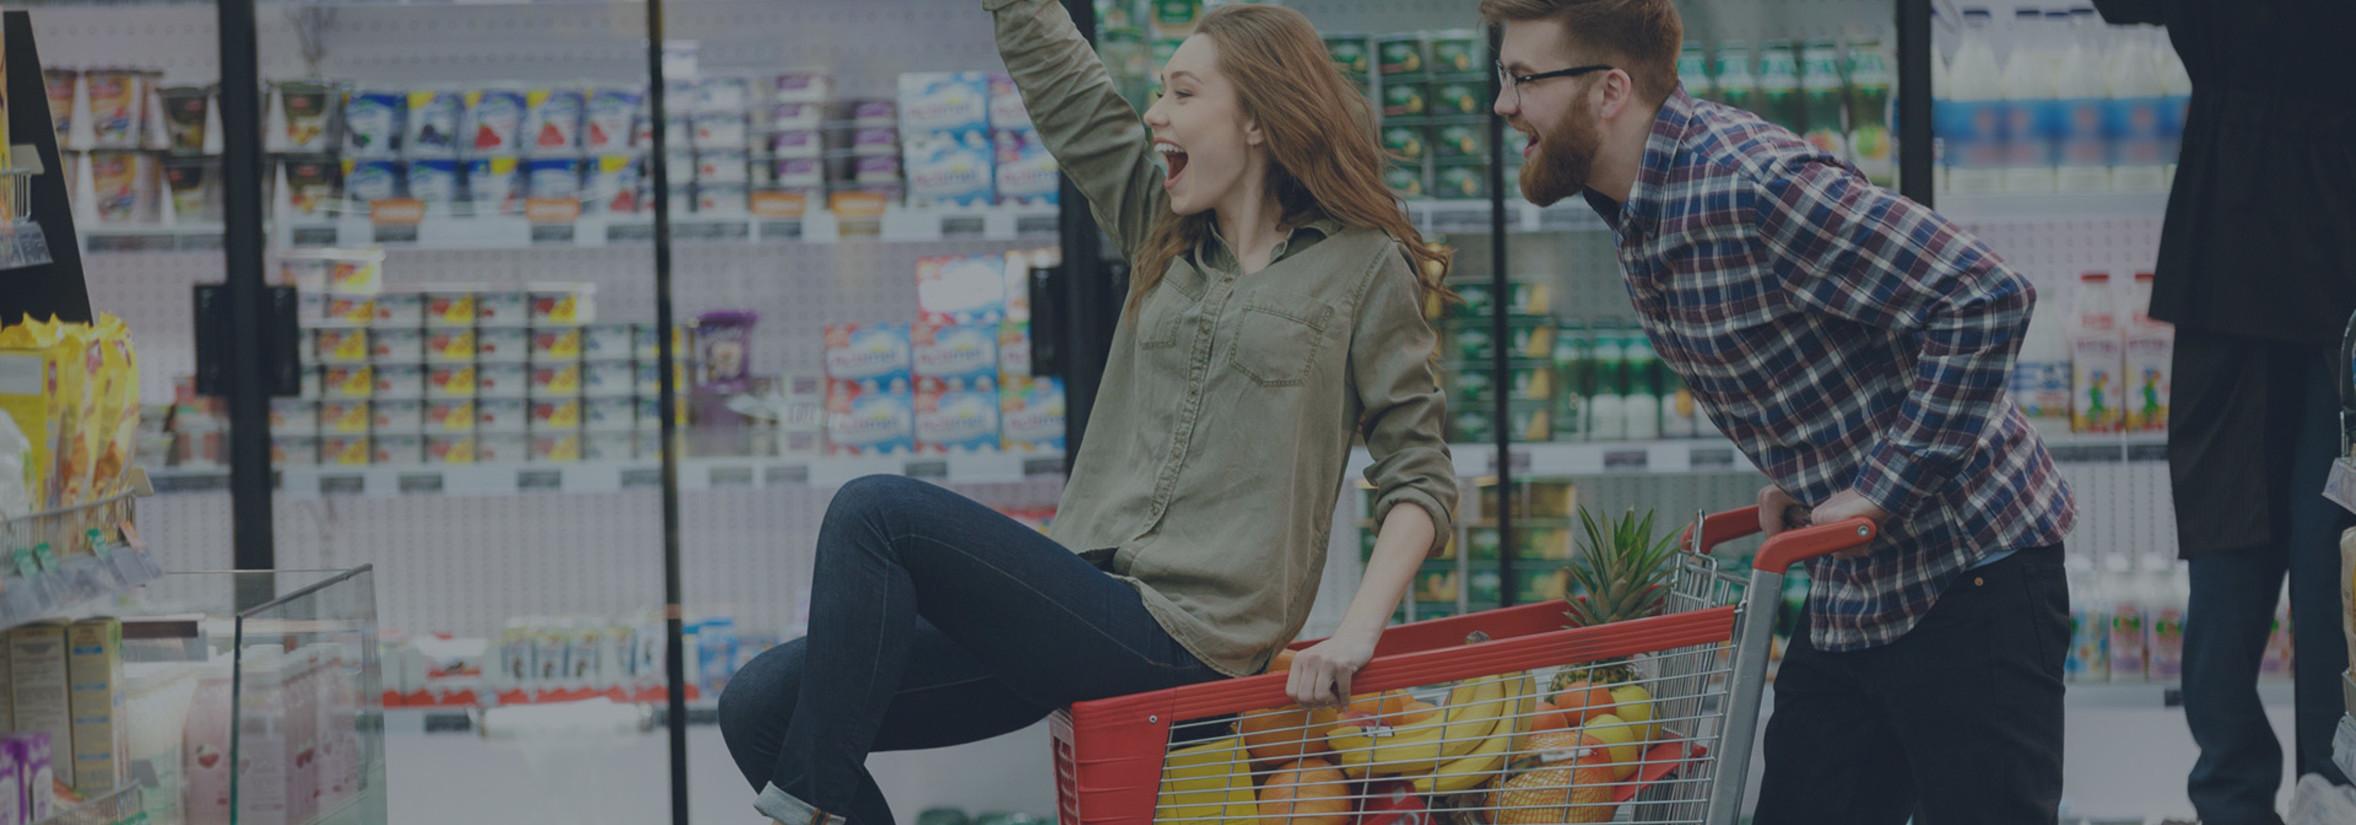 Meier Verpackungen, Lebensmittelverpackungen, Nahrungsmittelverpackungen